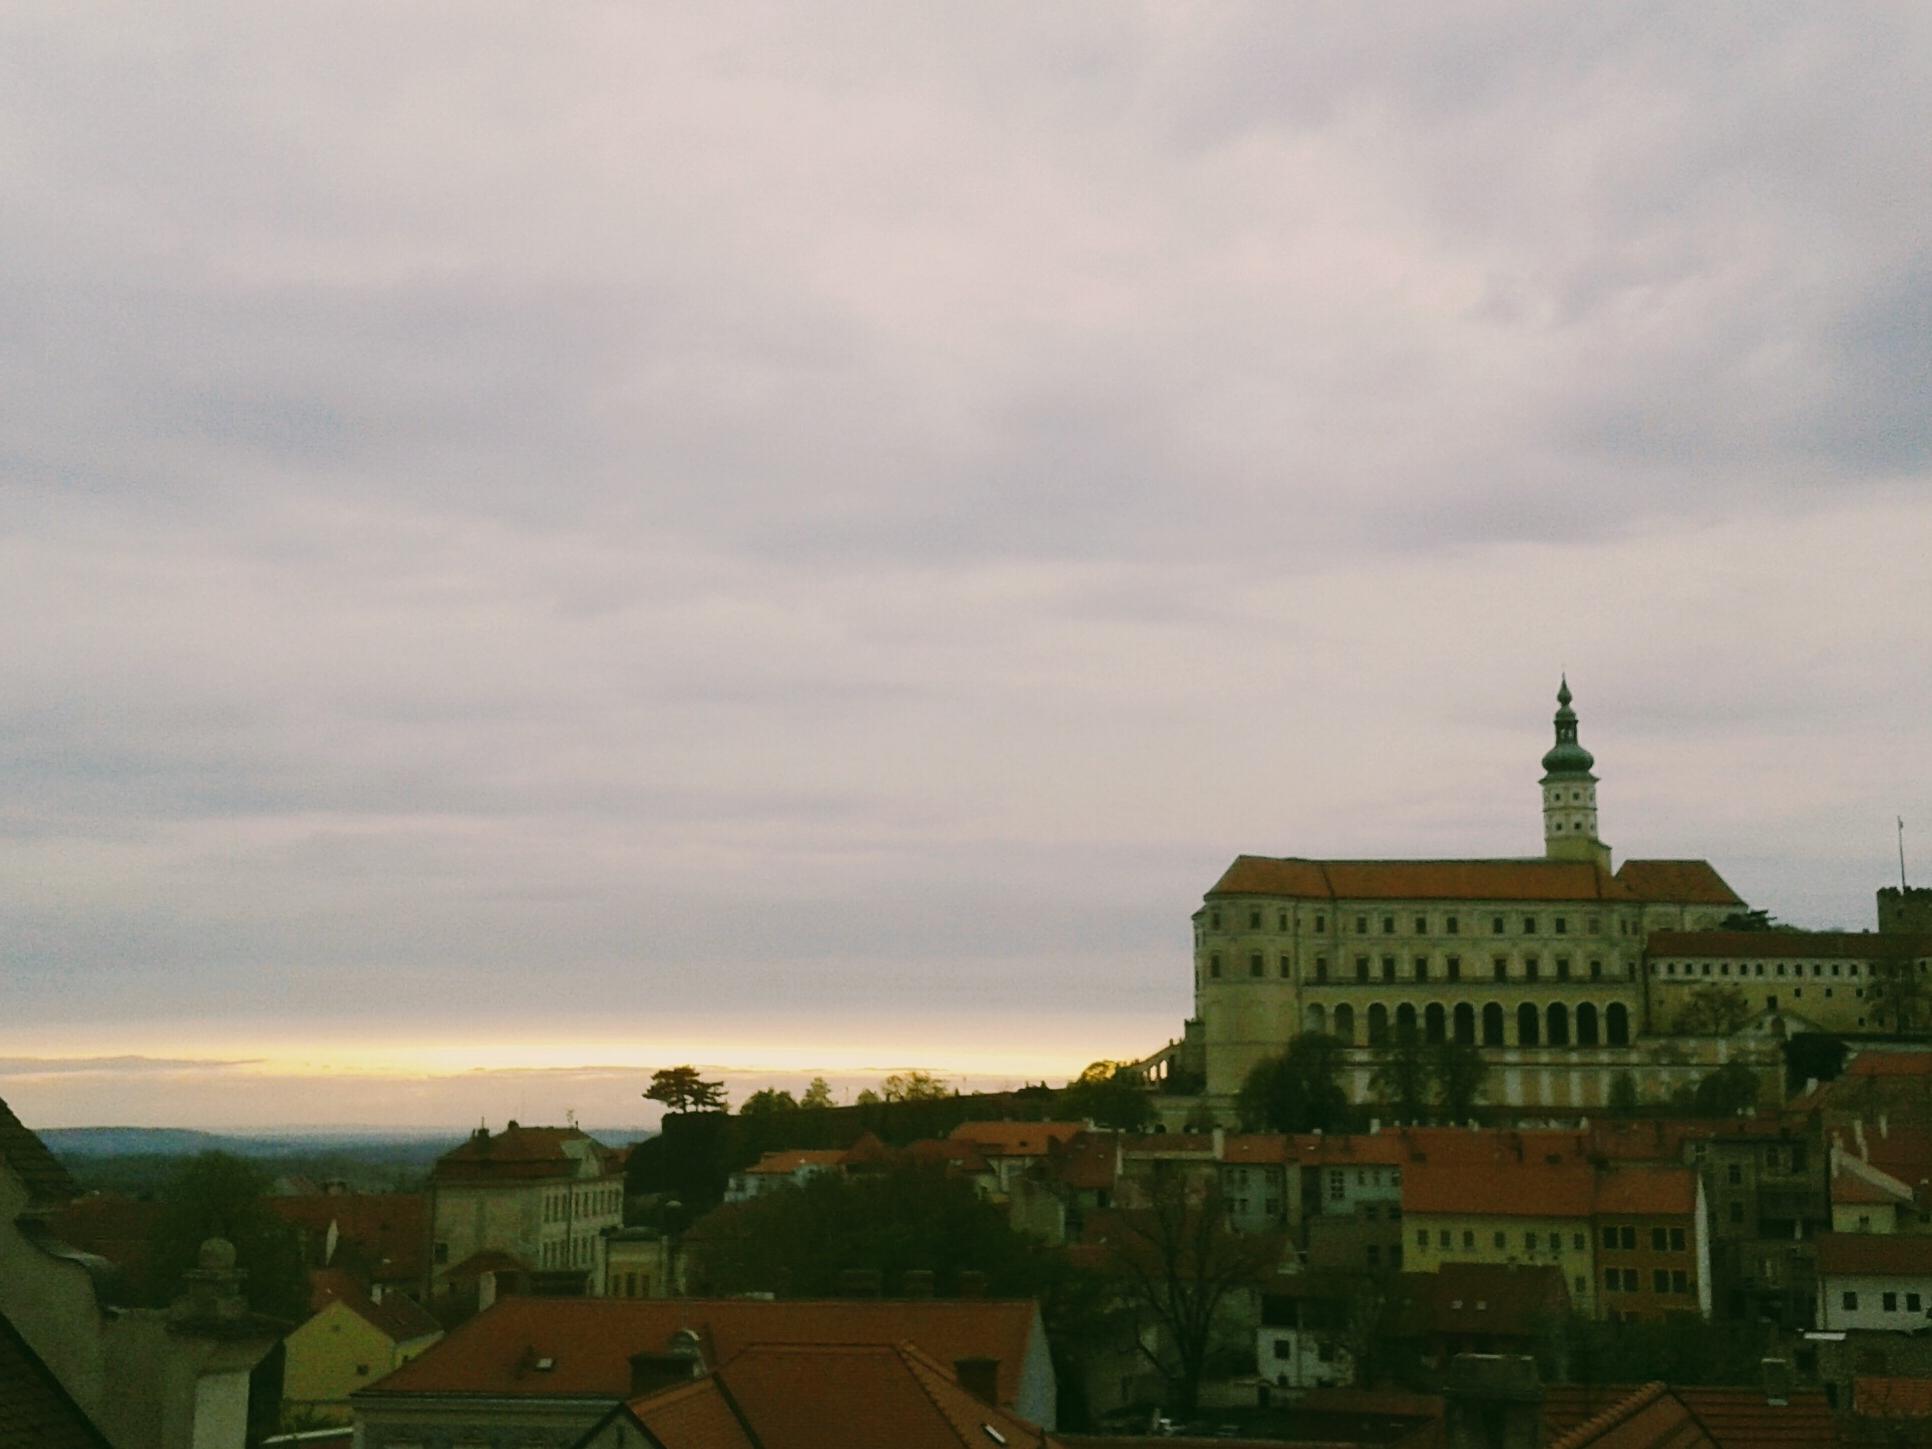 https://i.amy.gy/201804-slovakia-austria-czech/IMG_20180416_183510.jpg